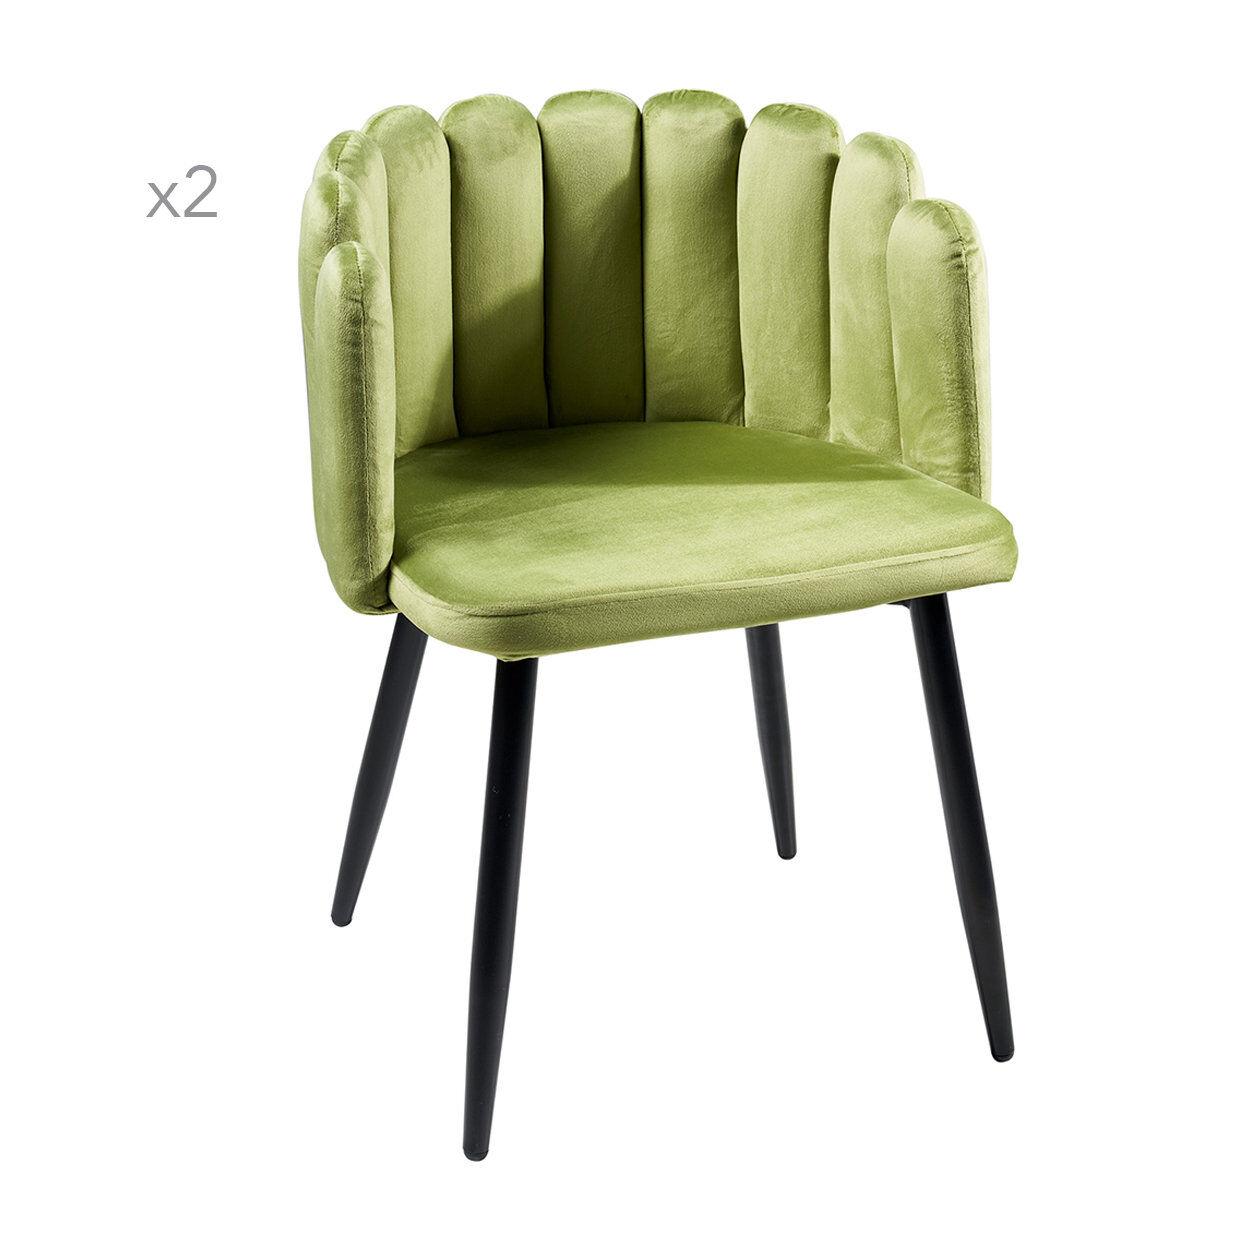 Novità Home Hug - Set 2 sedie pozzetto verde chiaro